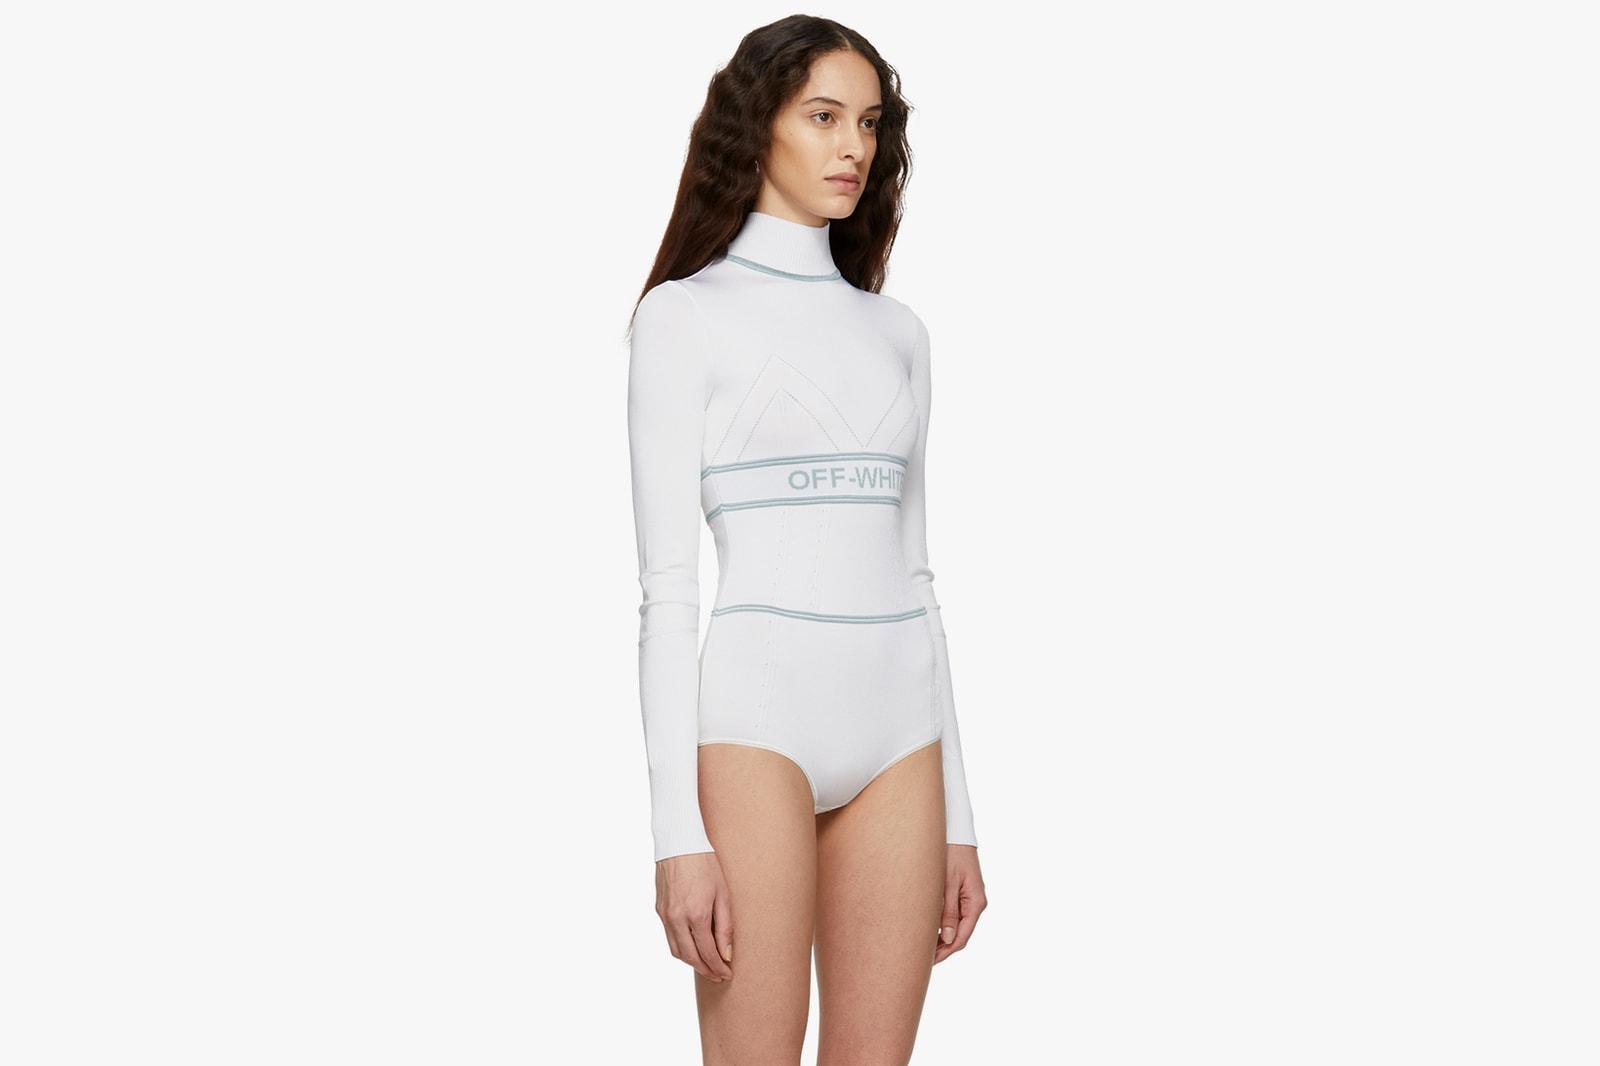 best bodysuits designer affordable winter bottega veneta free people off white